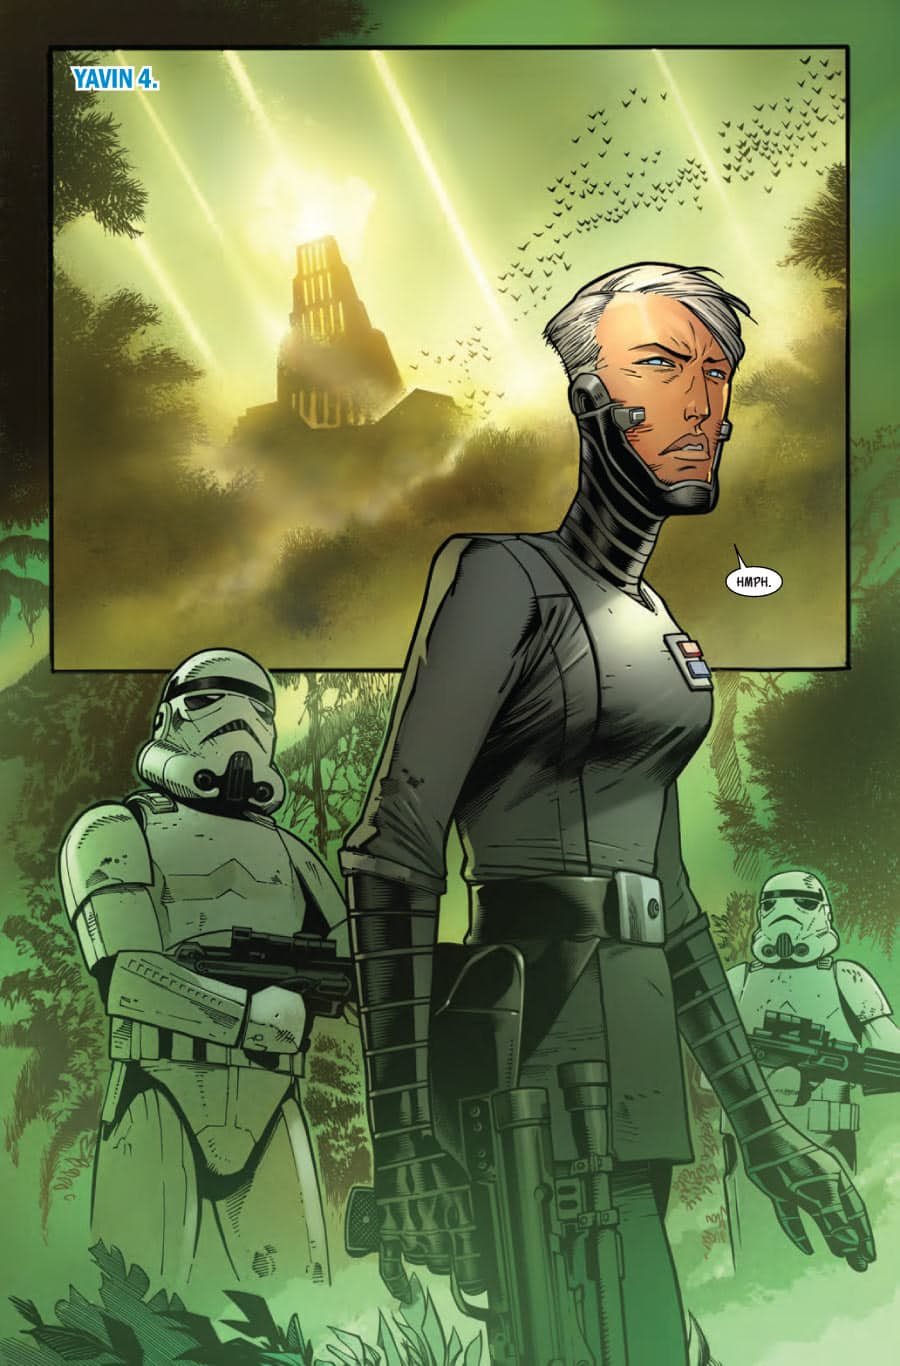 Images: Marvel Comics Star Wars: Doctor Aphra #4 Preview